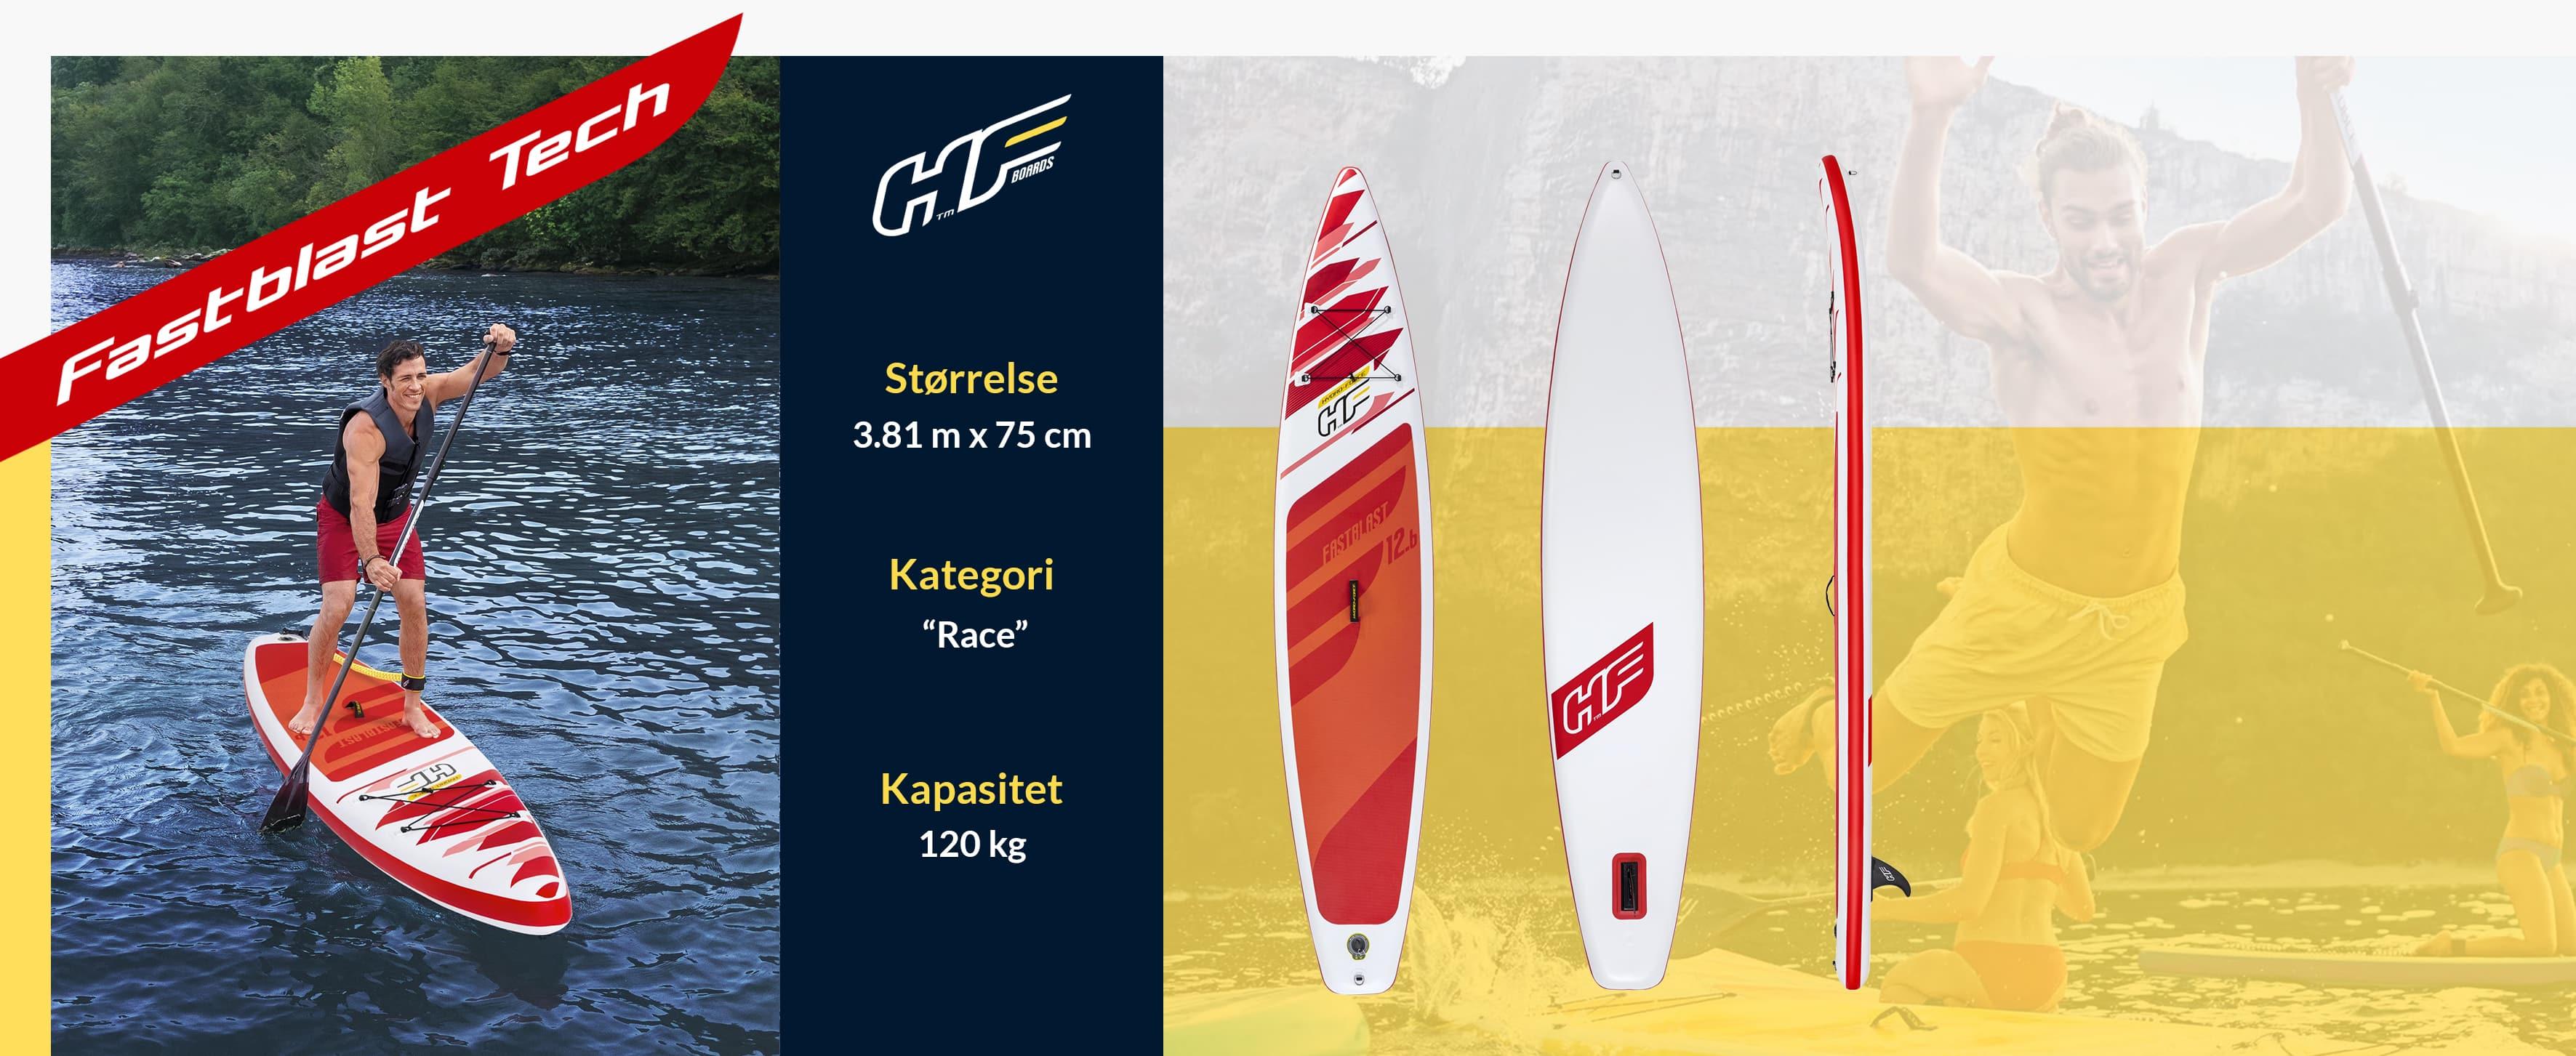 Fastblast Tech Paddle Board